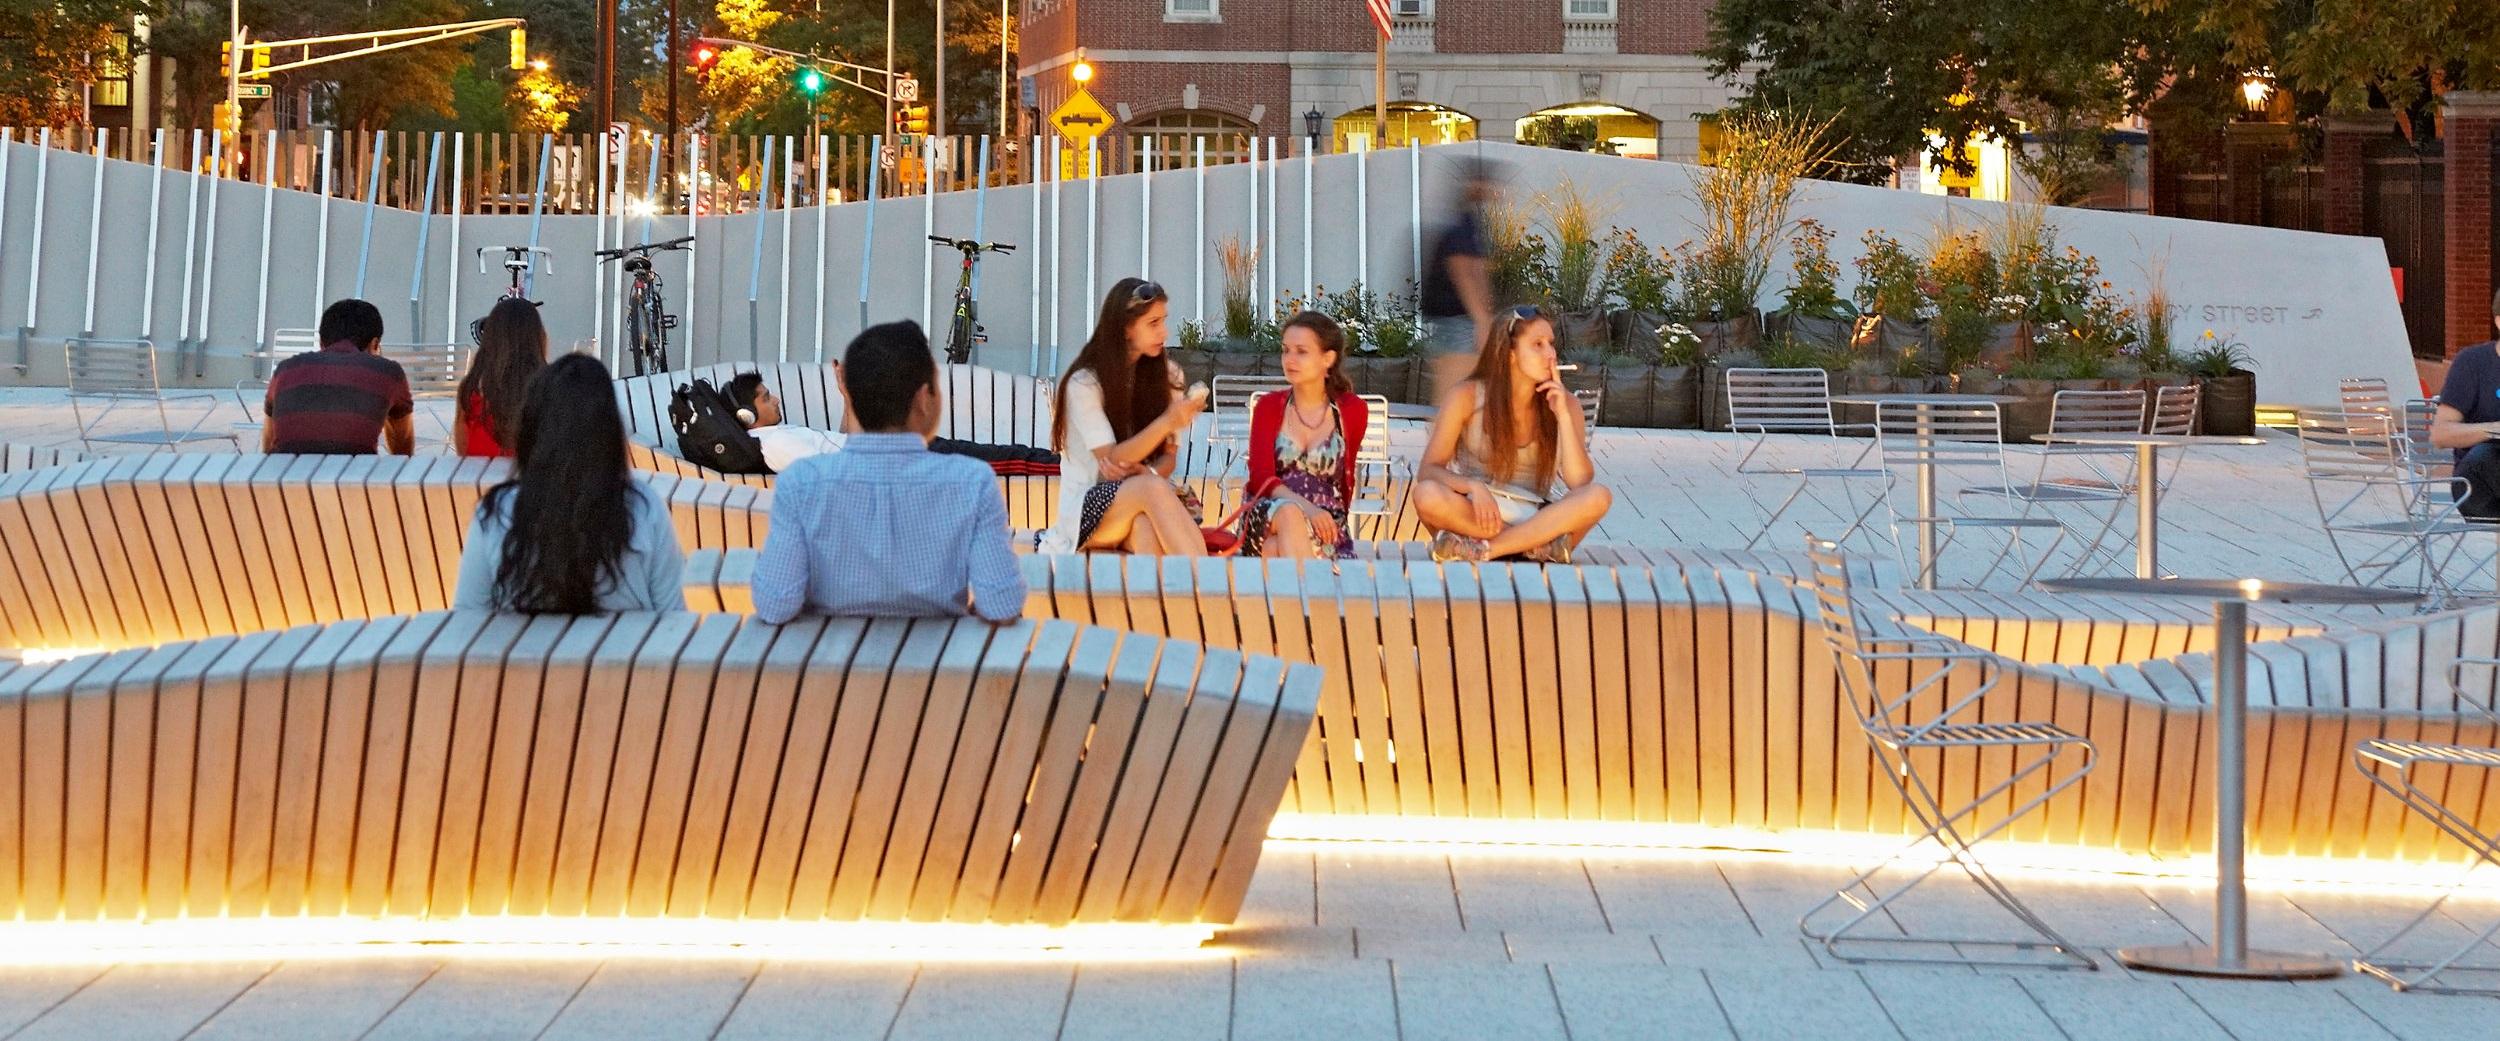 Harvard University Plaza custom designed benches.